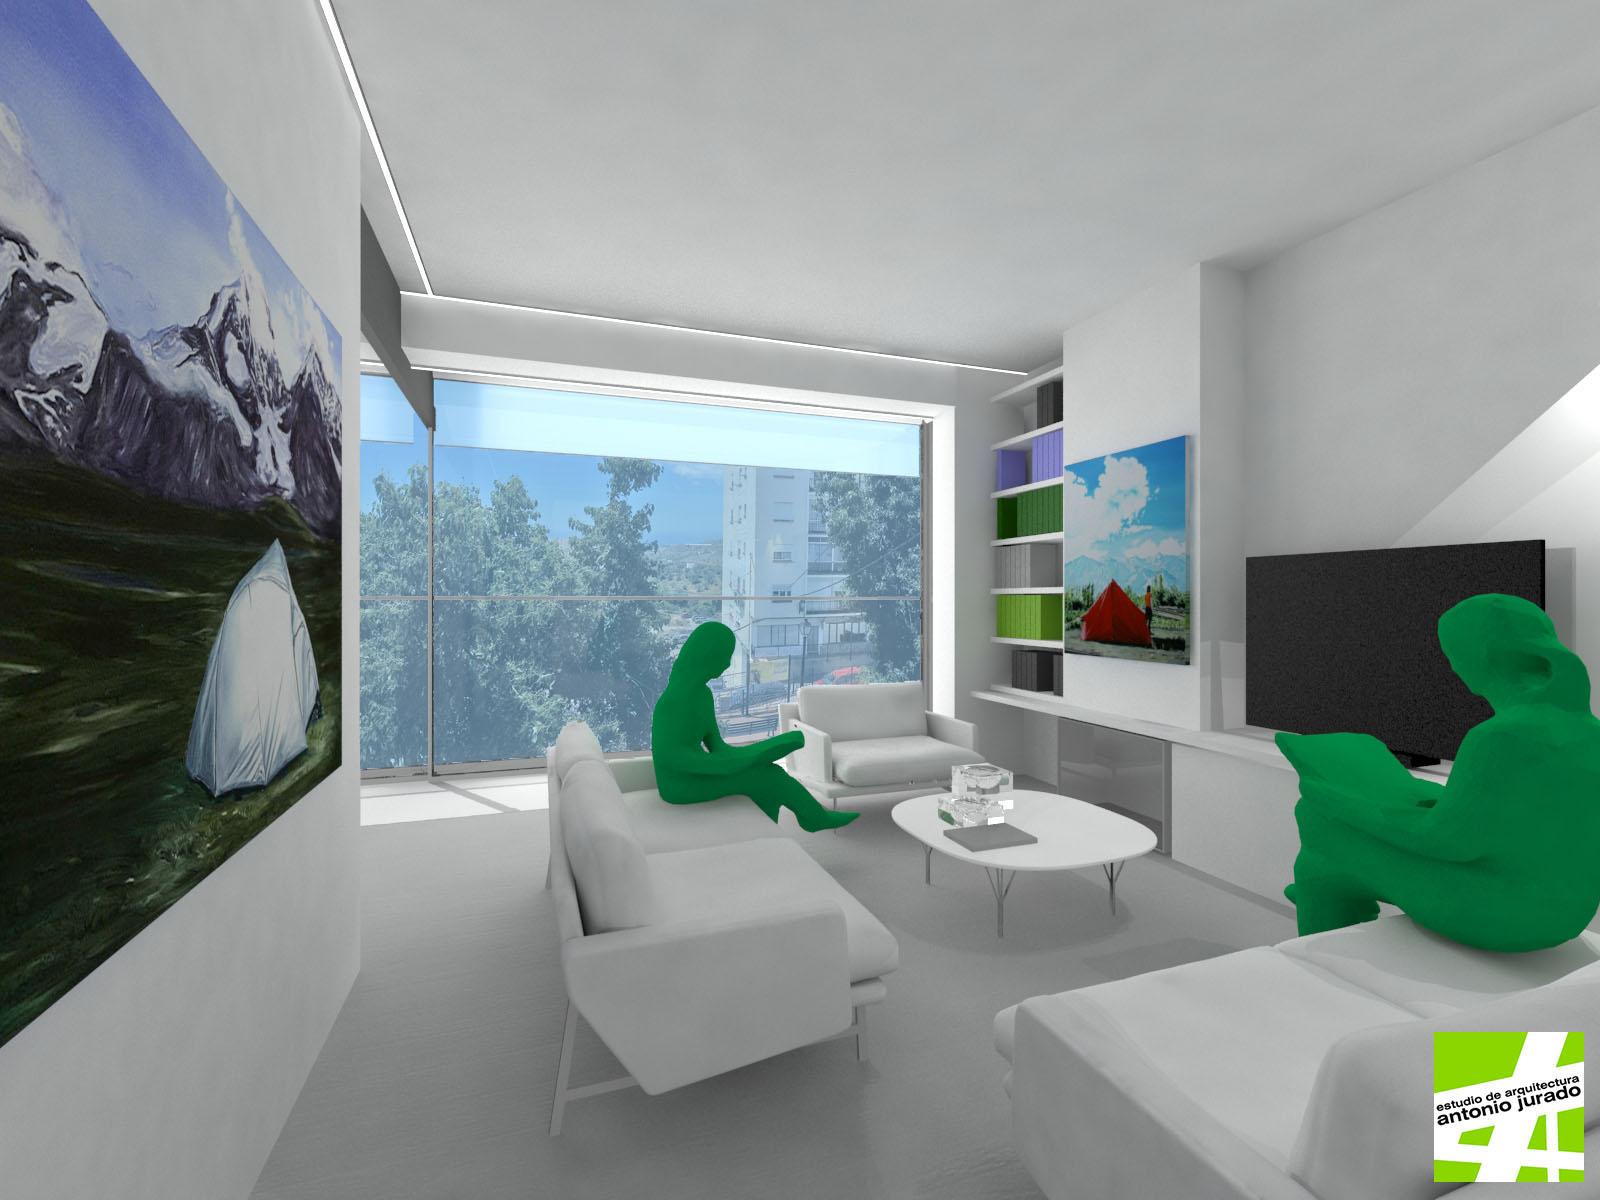 casa-ra-house-torrox-malaga-antonio-jurado-arquitecto-06